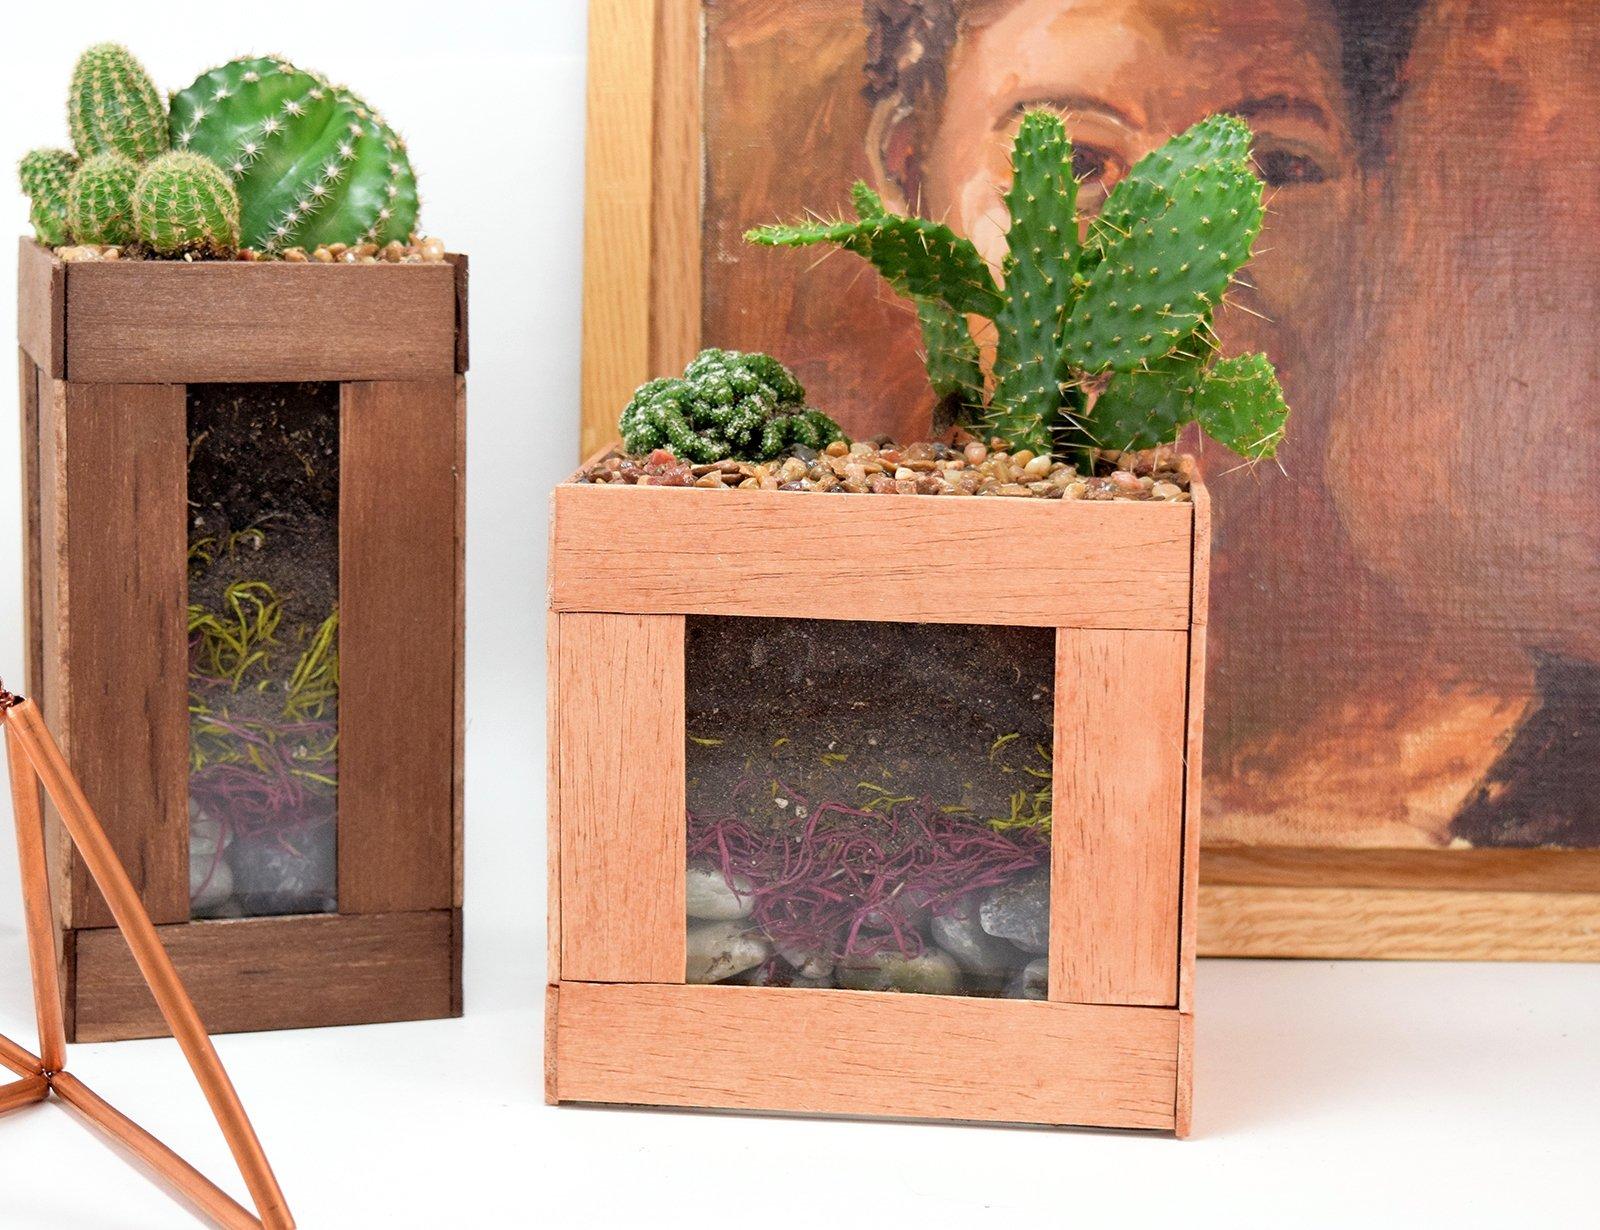 featured image of Summer Trend: DIY Faux Succulent & Cactus Home Décor article